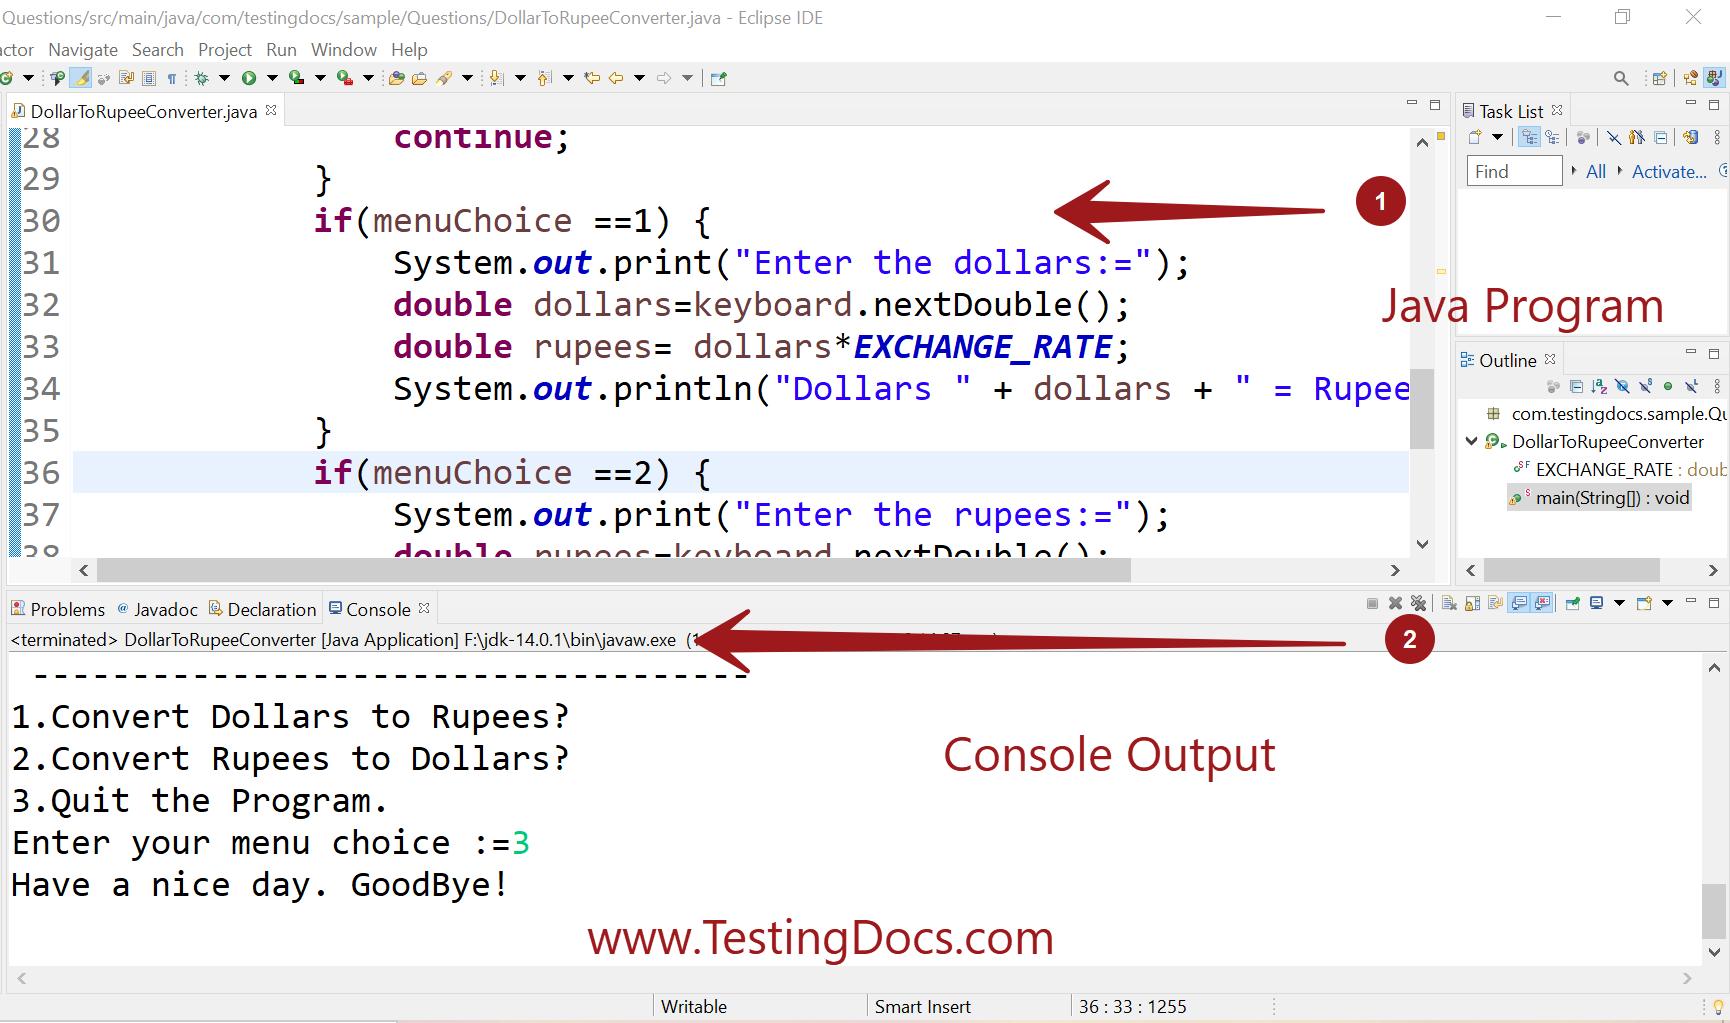 Dollar to Rupee Java Program